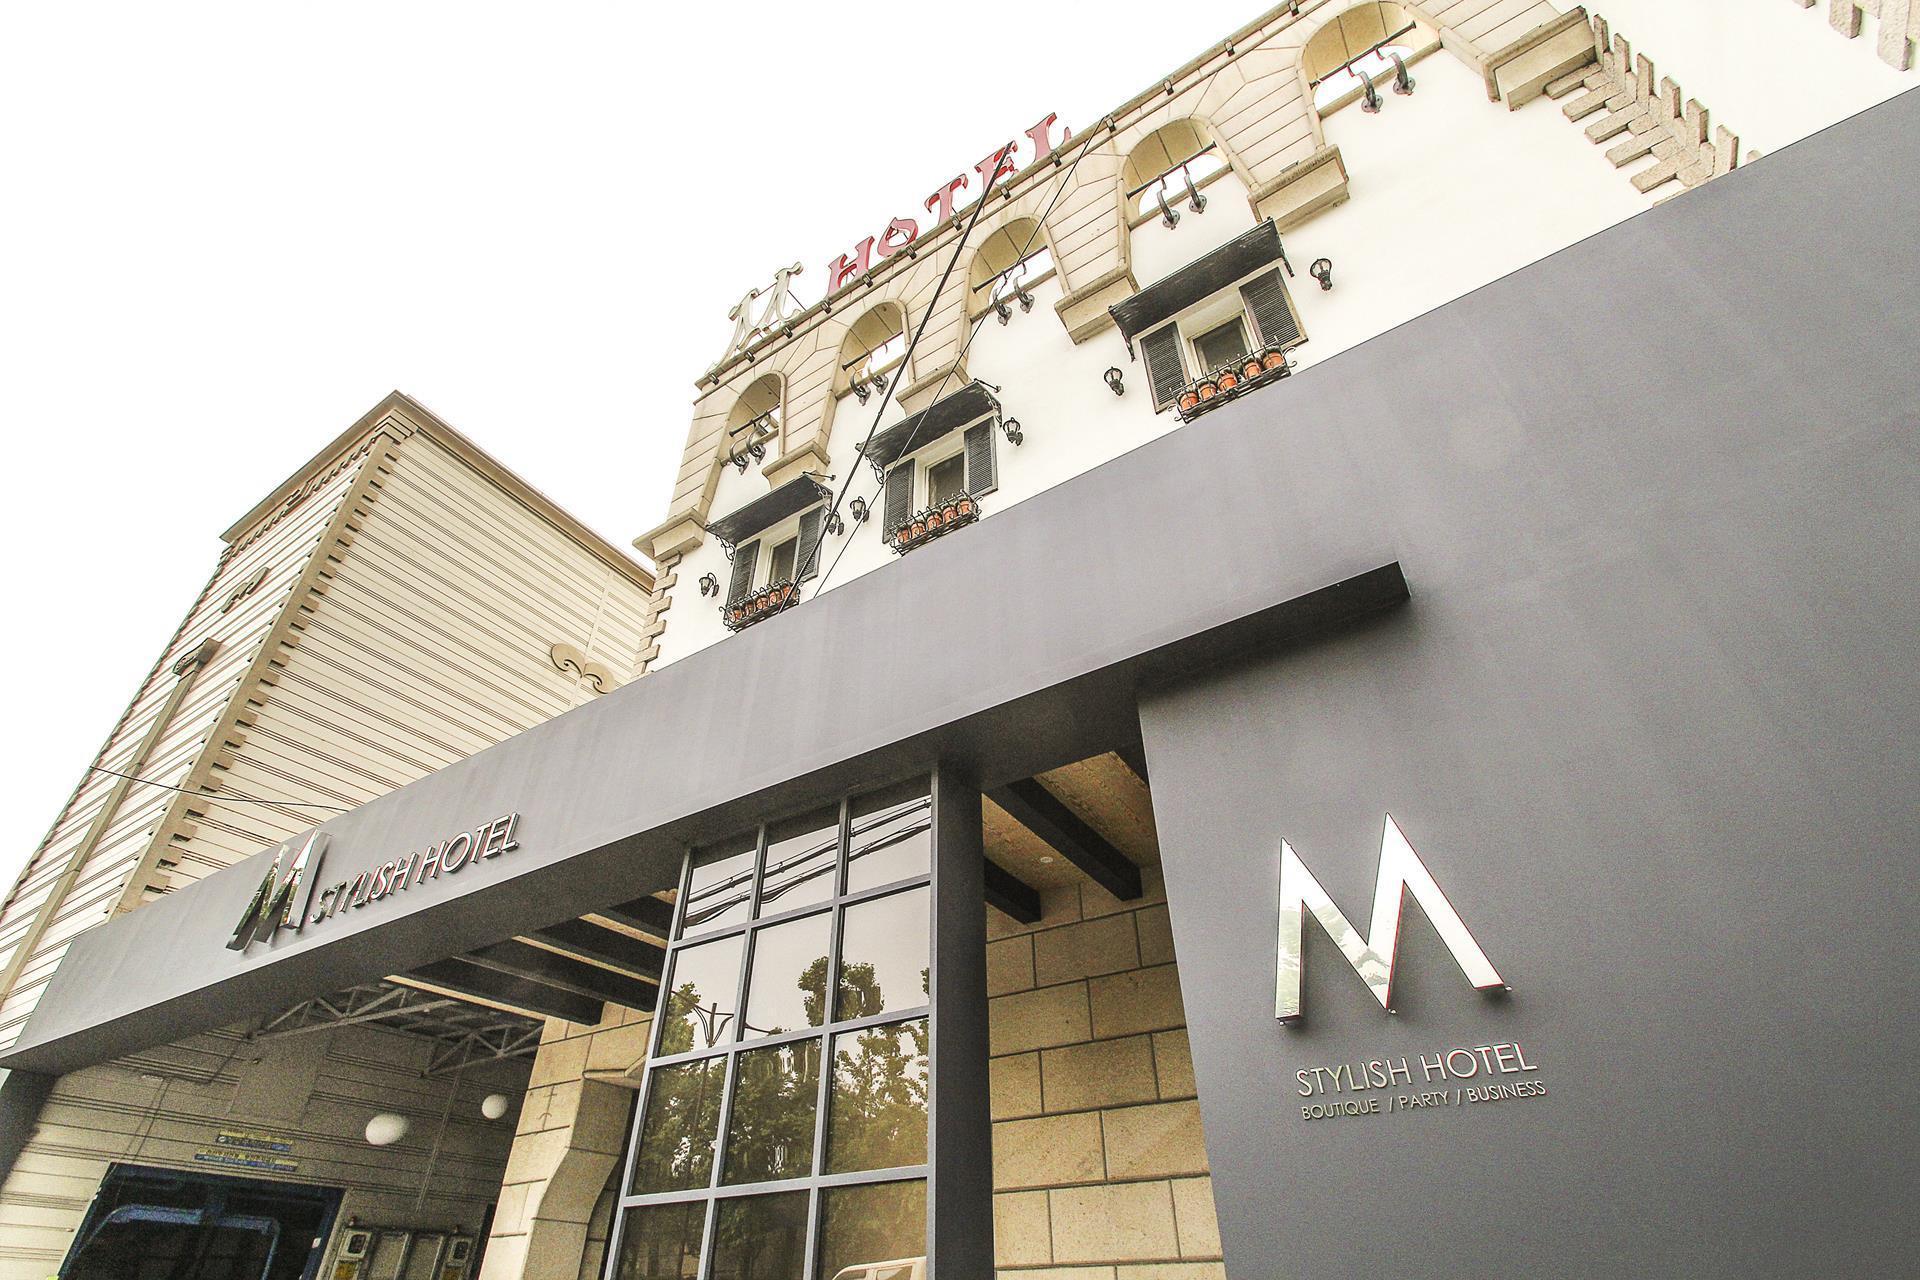 Styilsh M Hotel